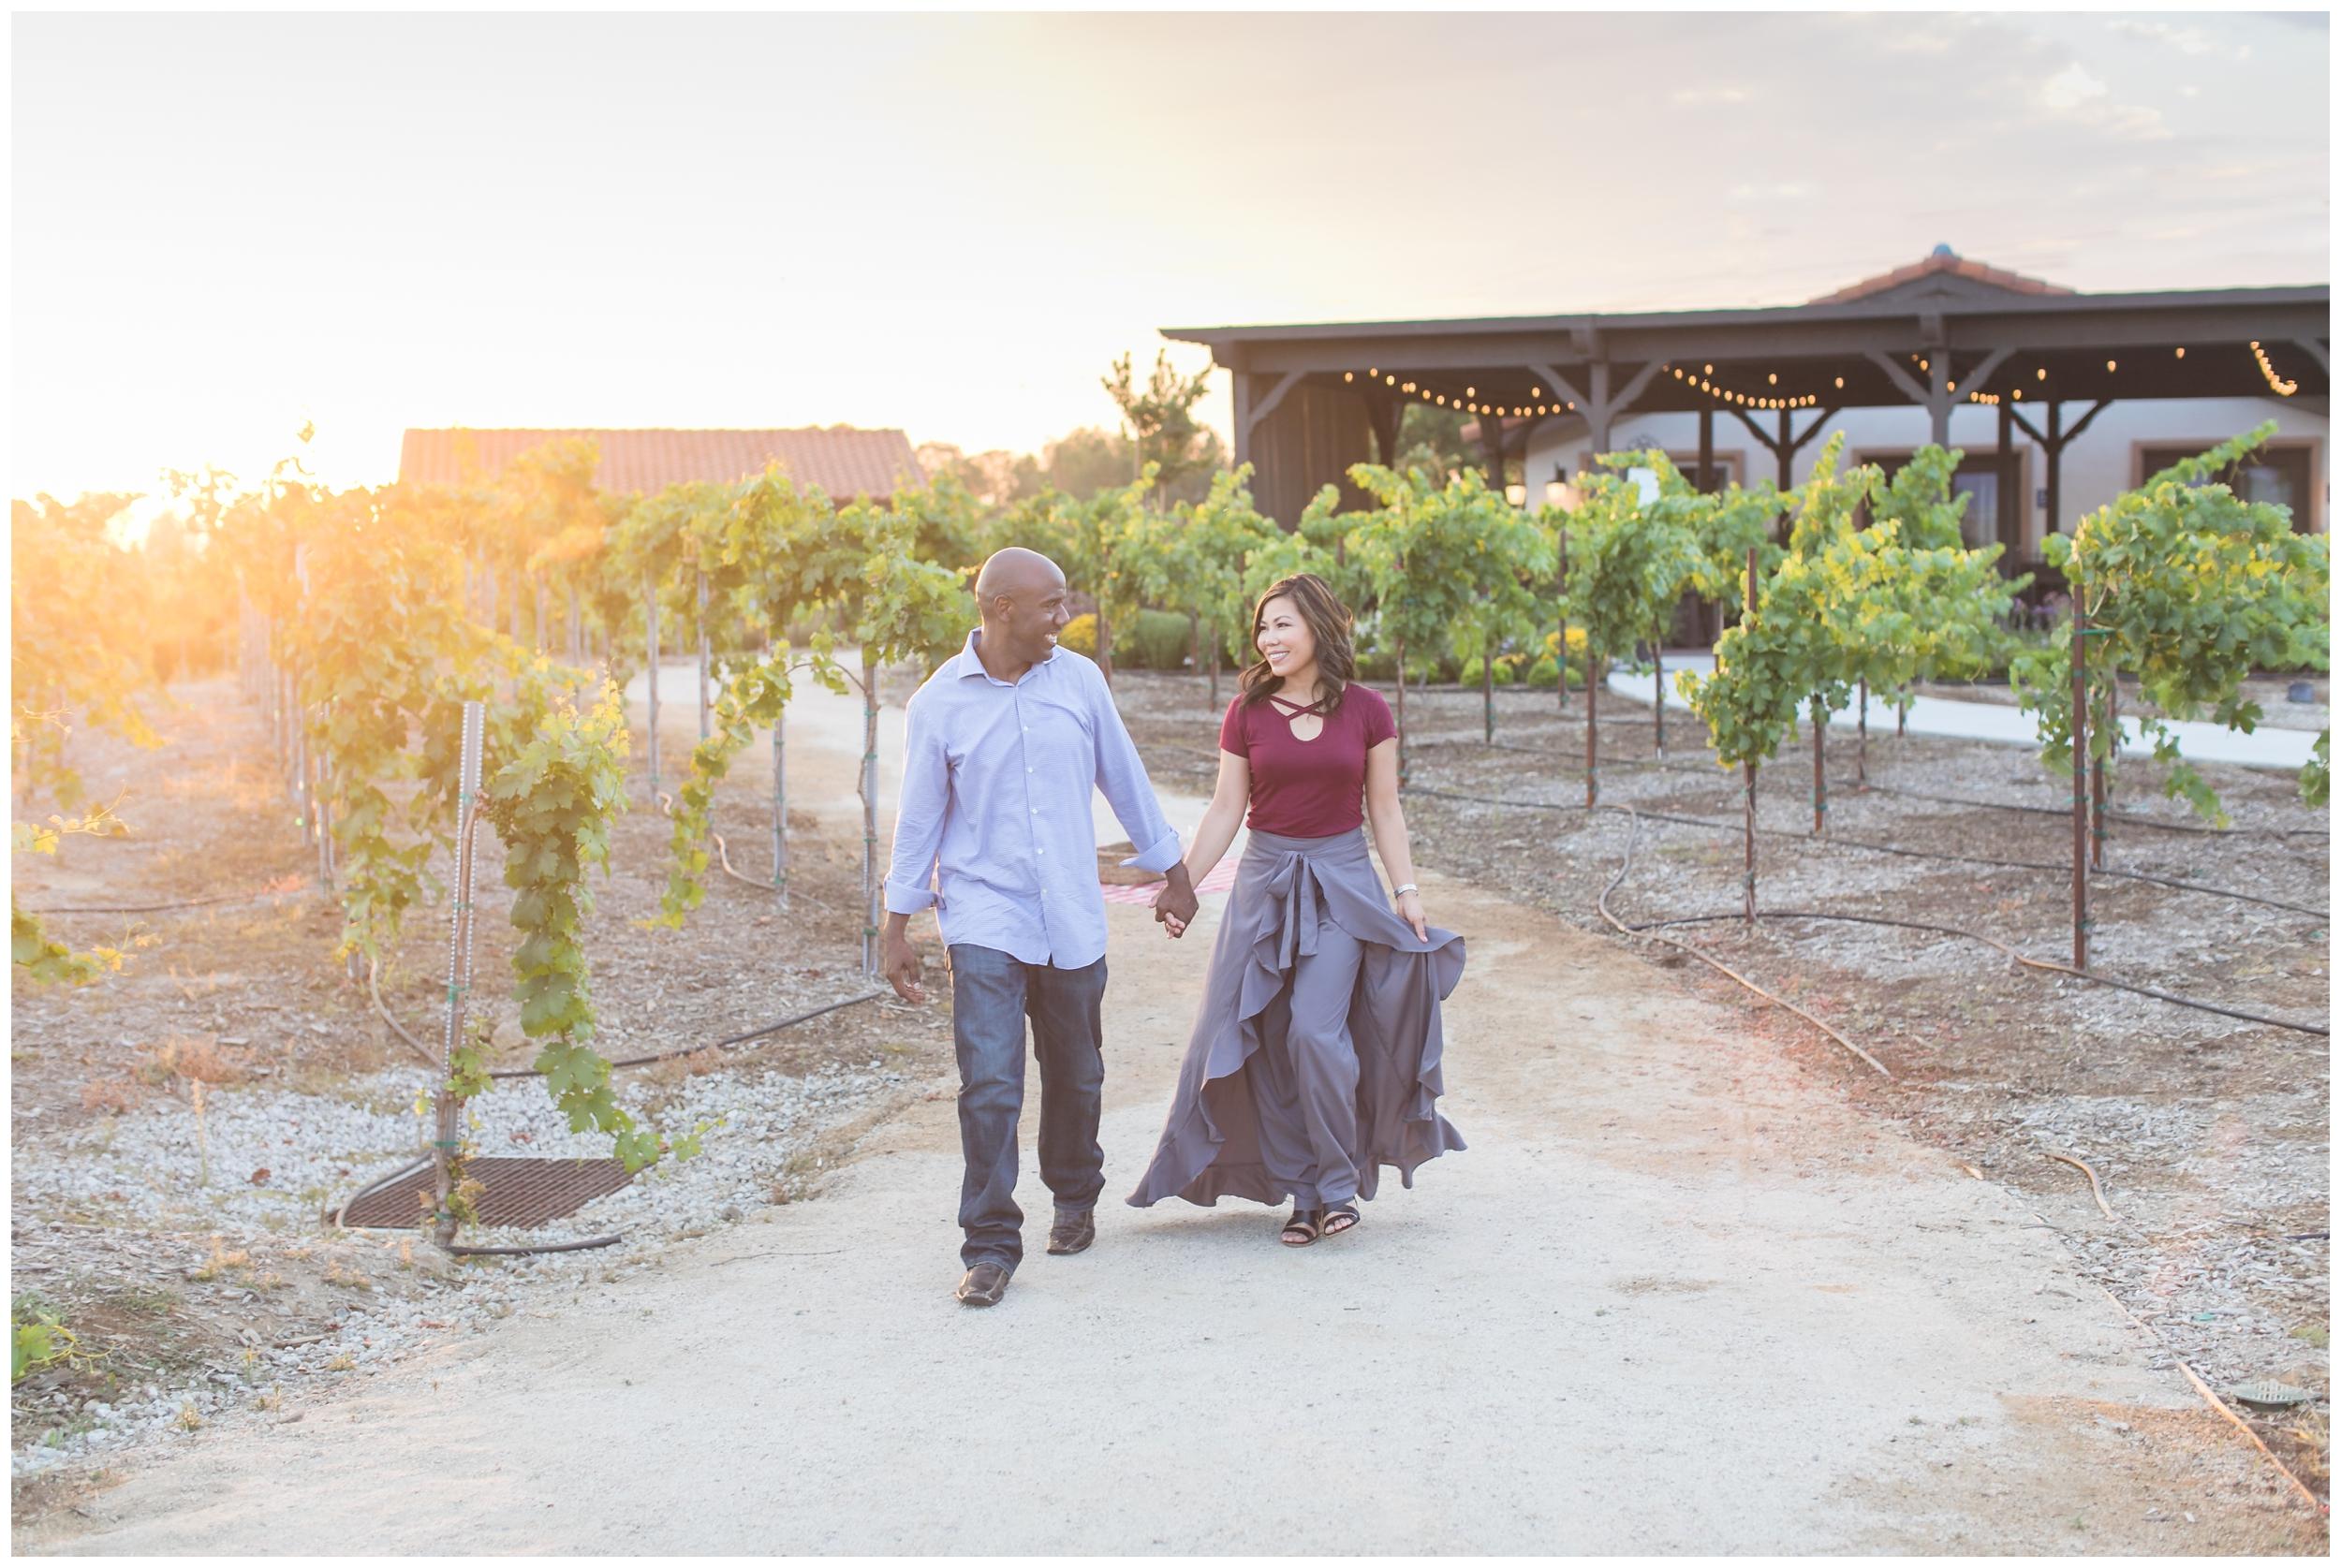 temecula-winery-engagement-wedding-photographer-carrie-vines0020.jpg